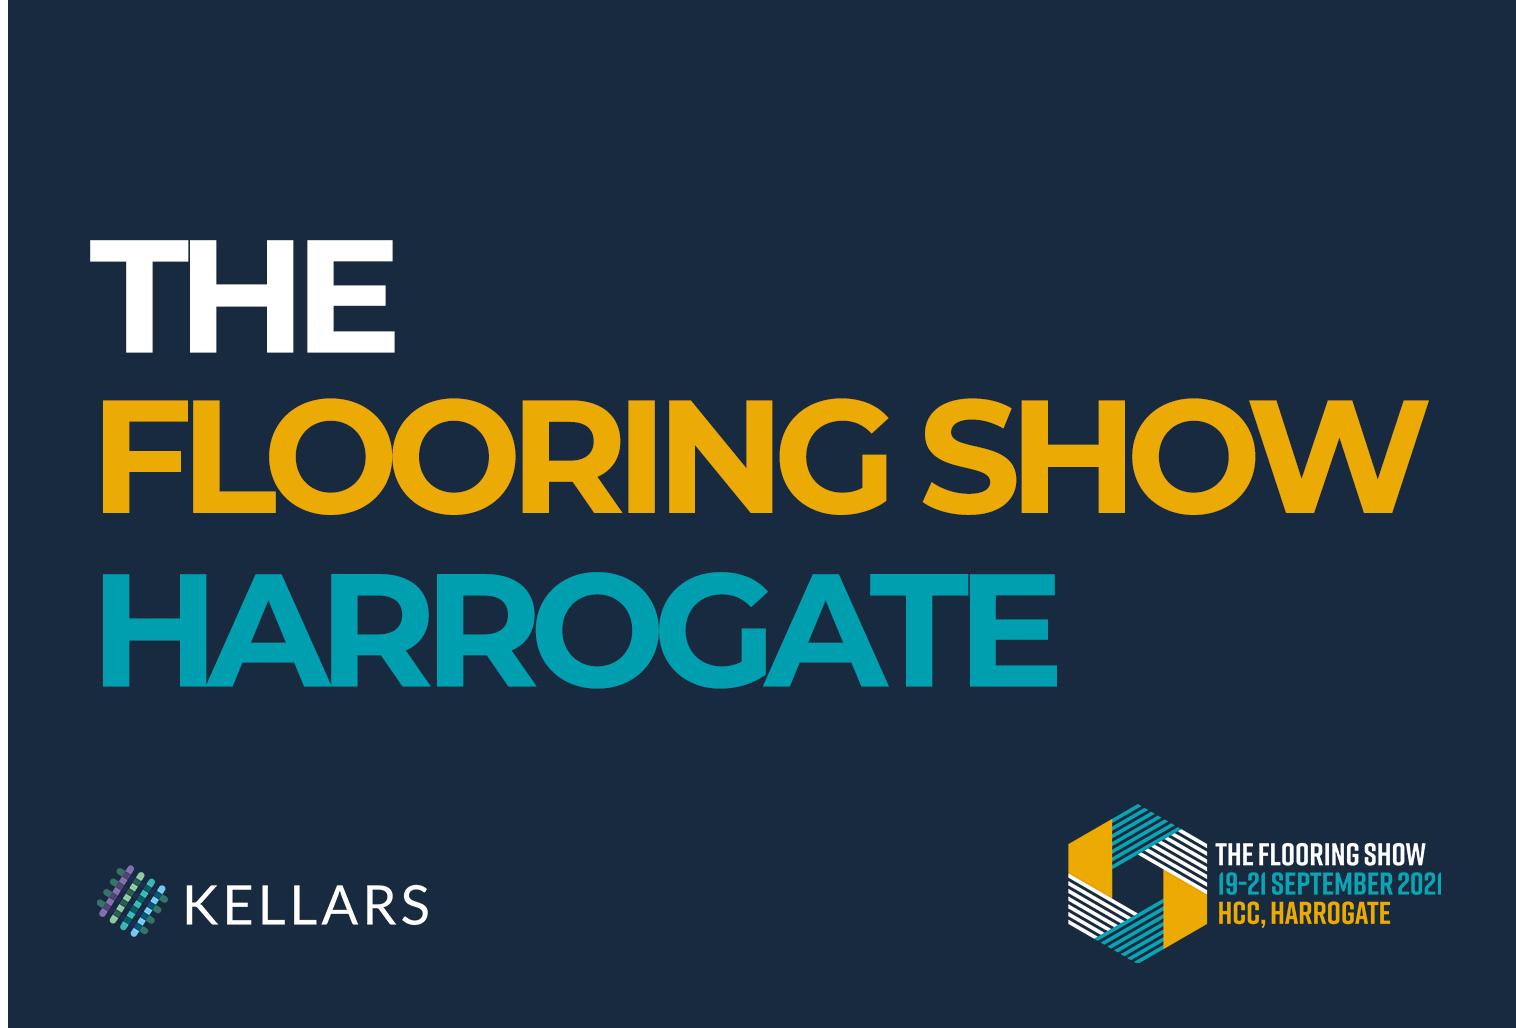 Flooring show harrogate logo